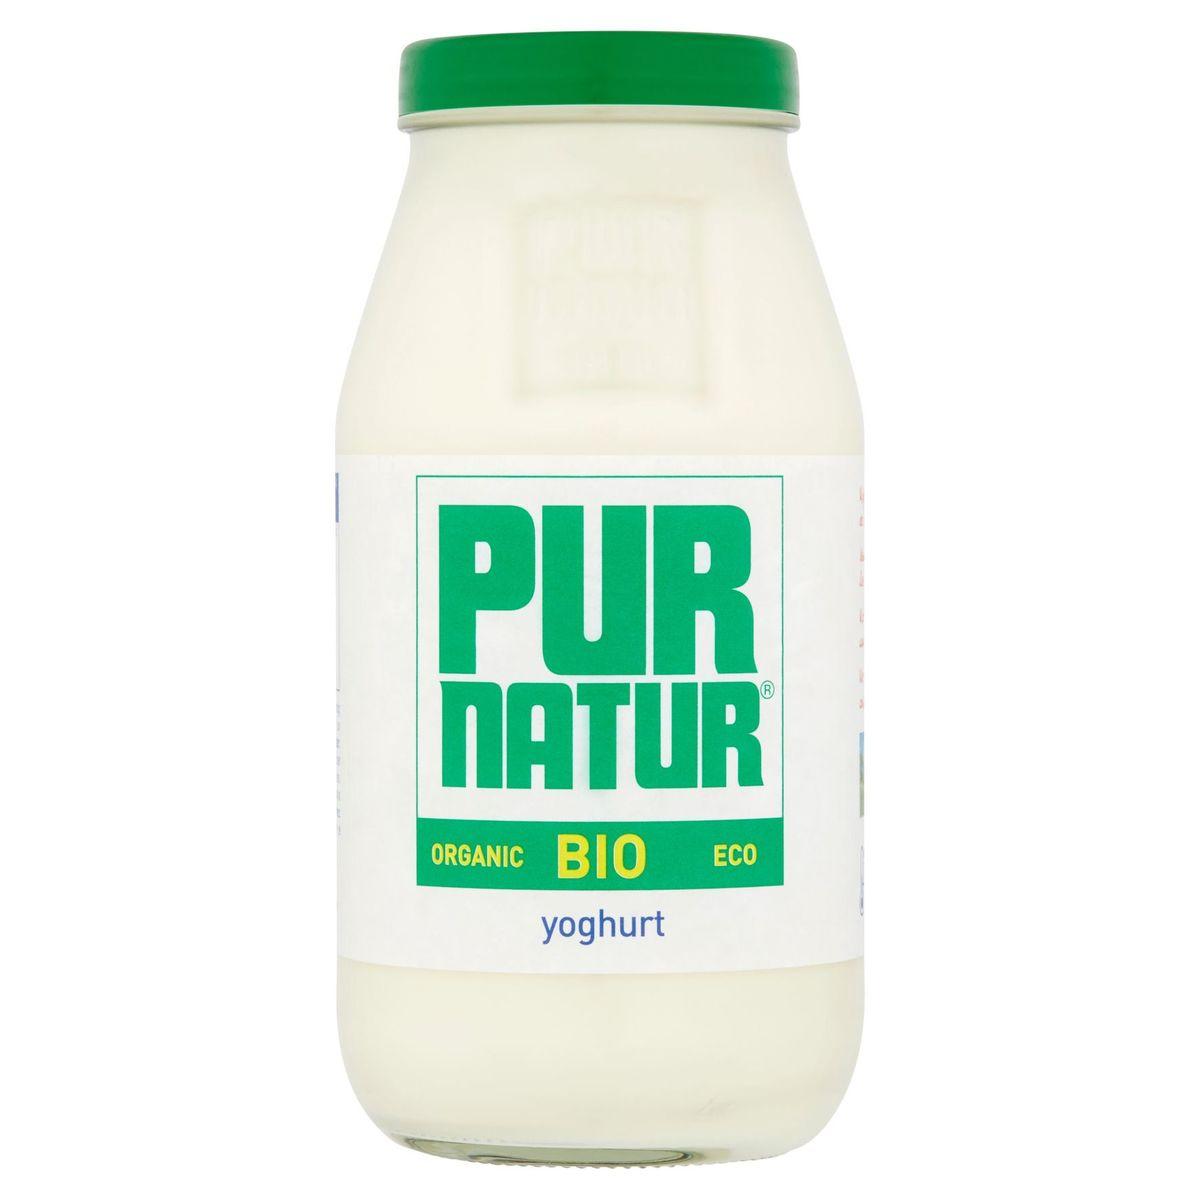 Pur Natur Bio Yoghurt 500 g